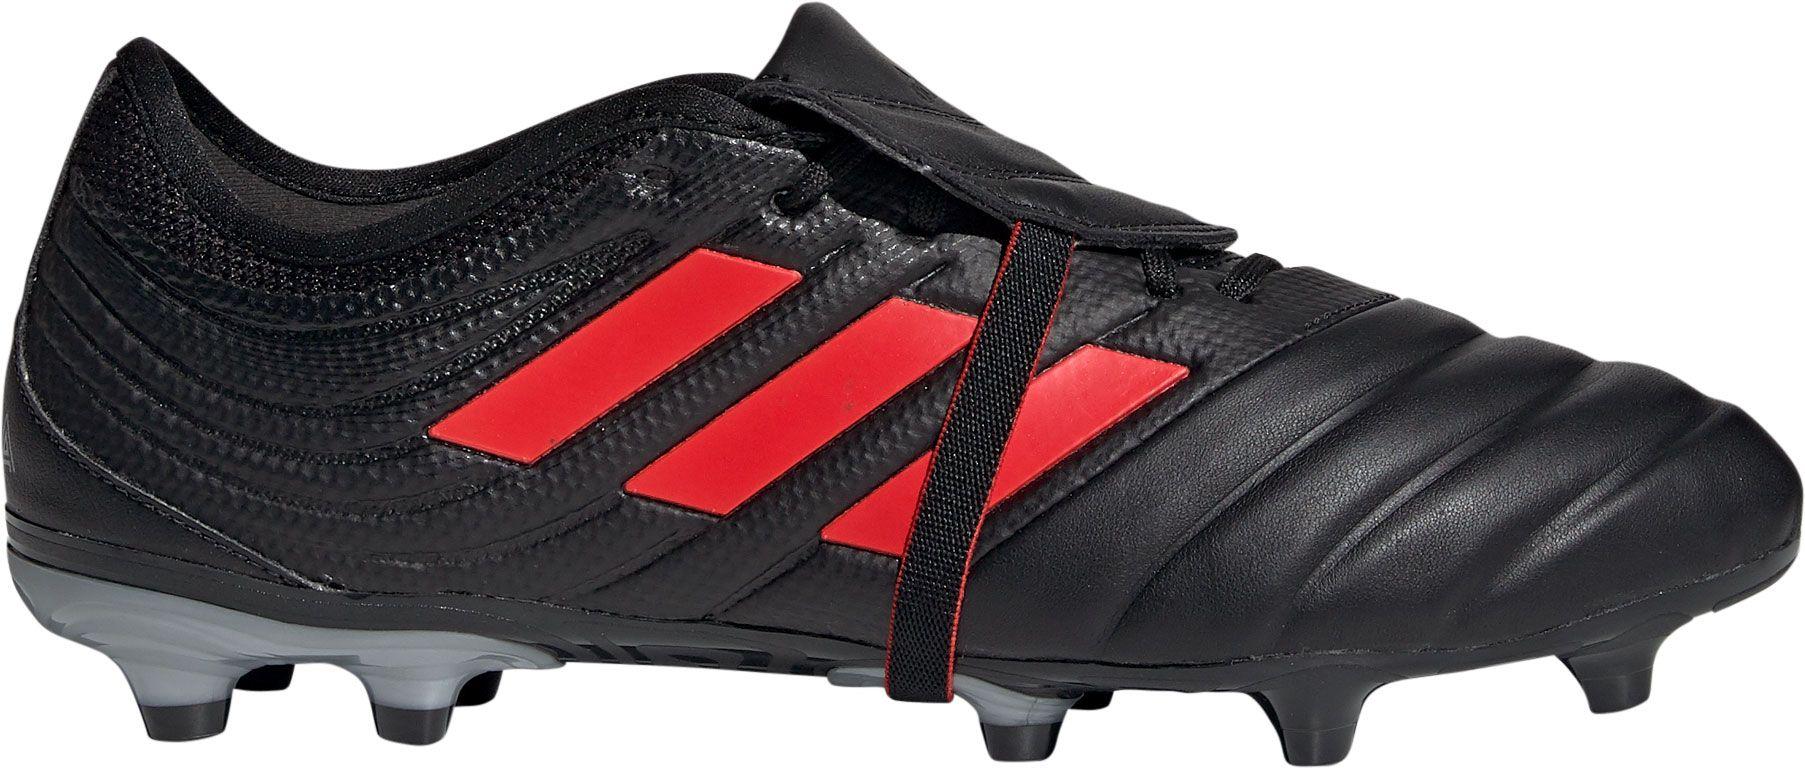 adidas Men's Copa Gloro 19.2 FG Soccer Cleats, Size: 6.5, Black